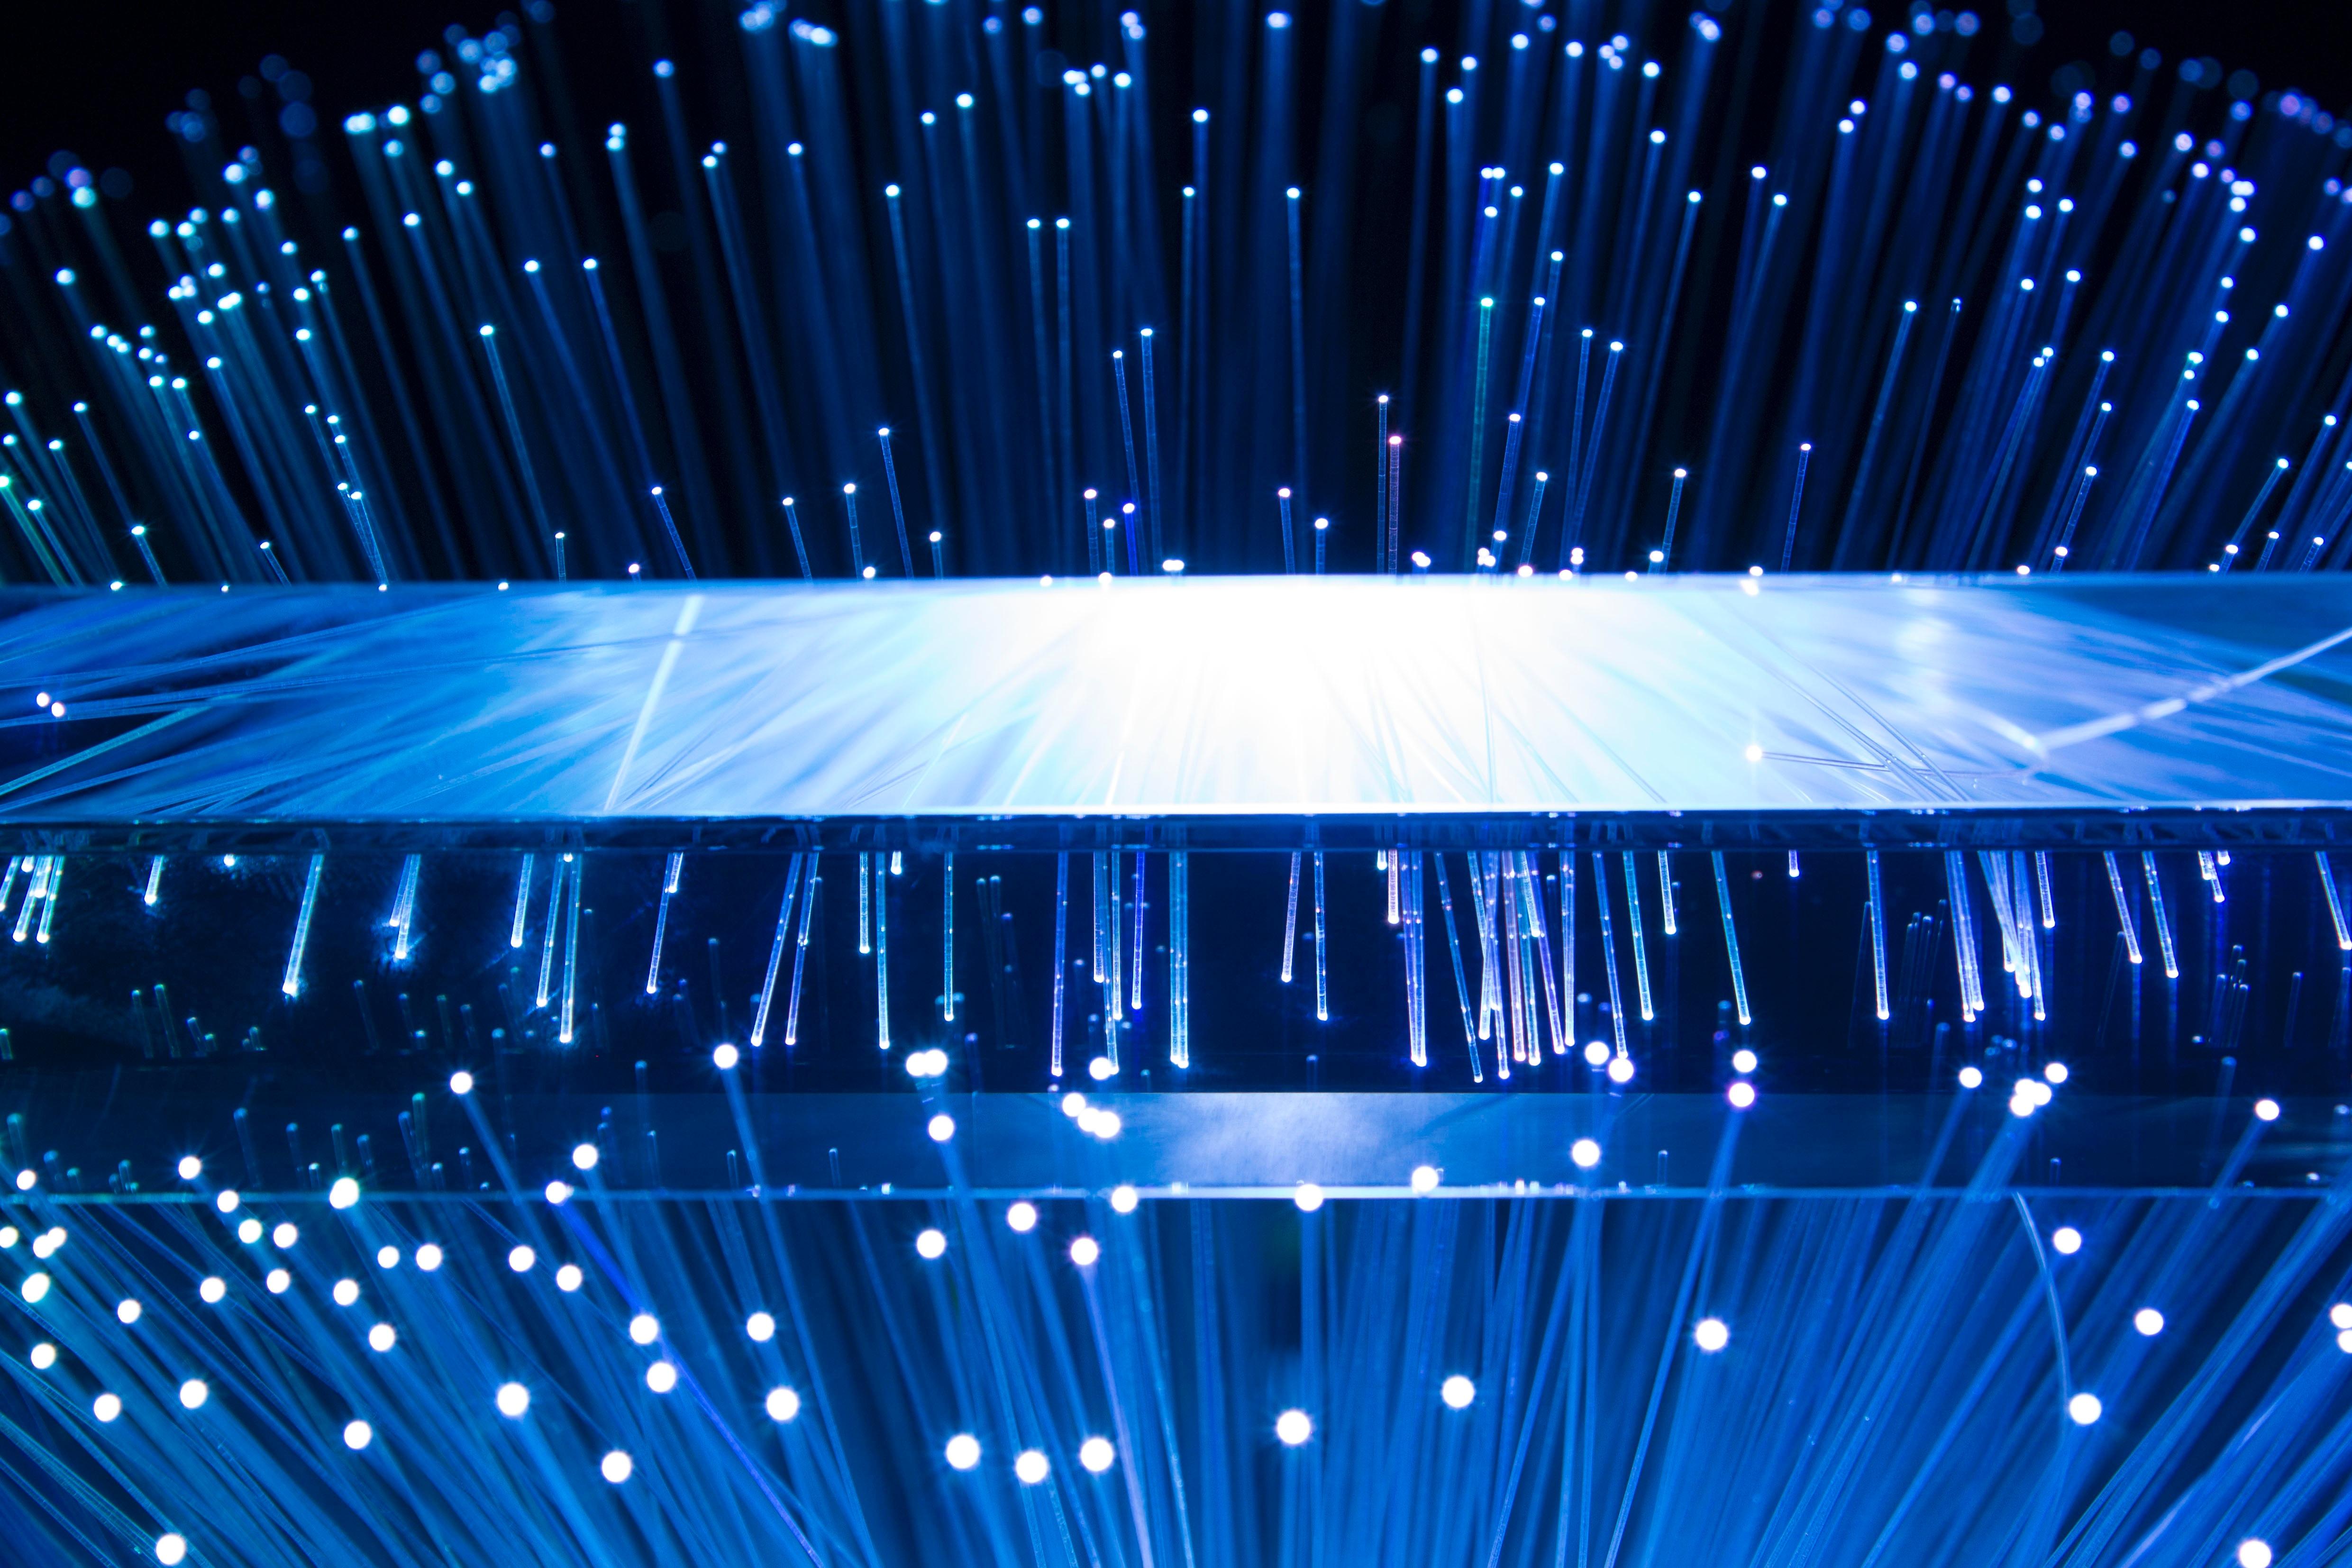 Blue Fiber Optic Image